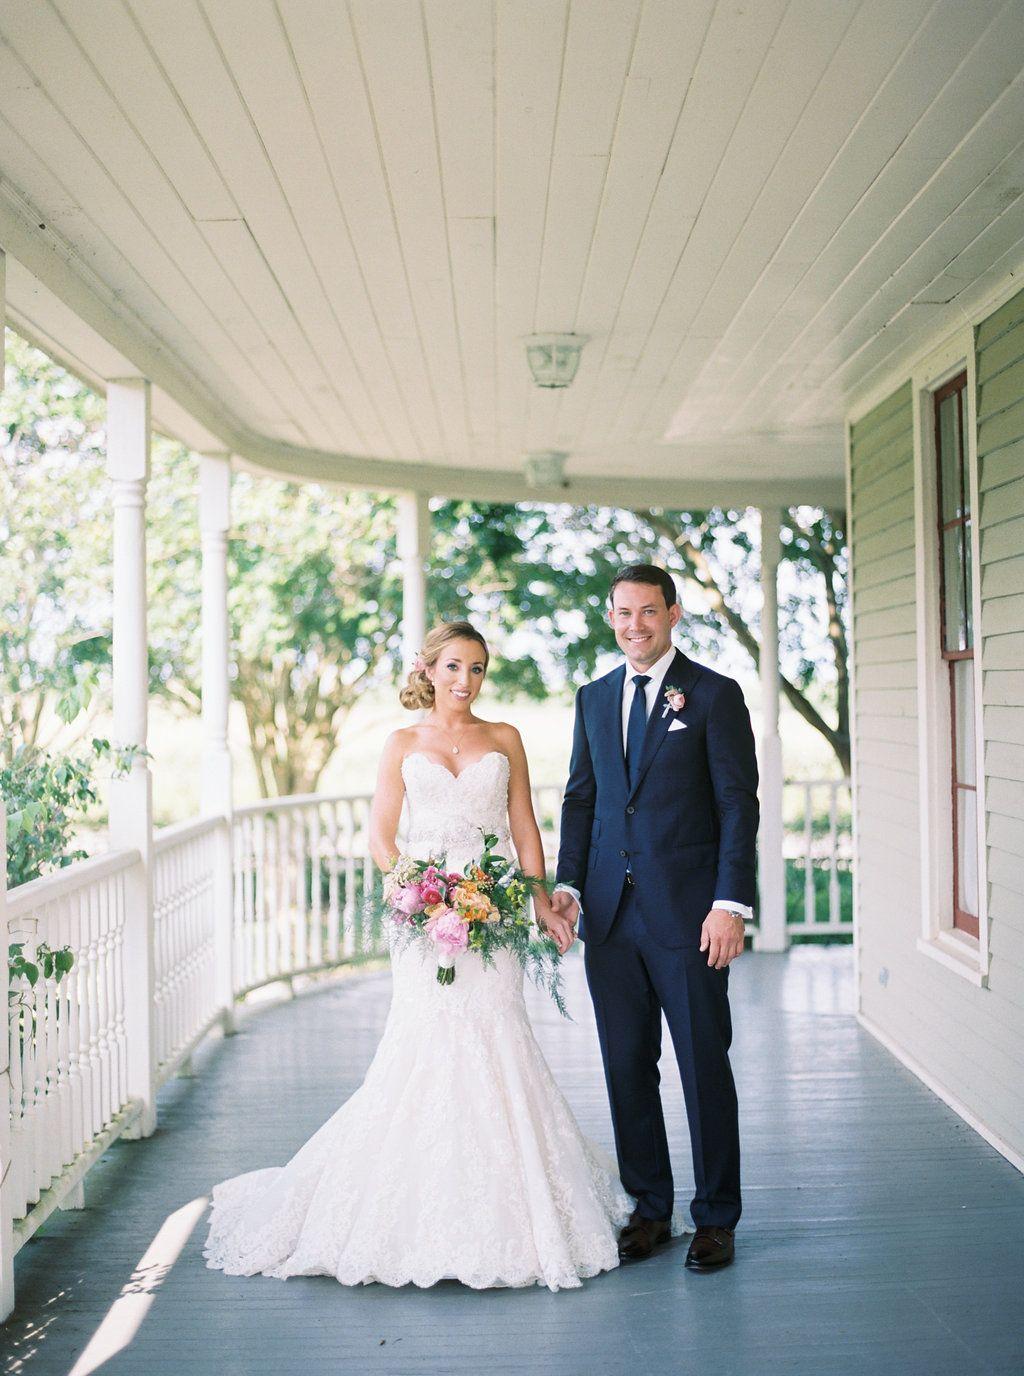 aprylann_wedding_274.jpg